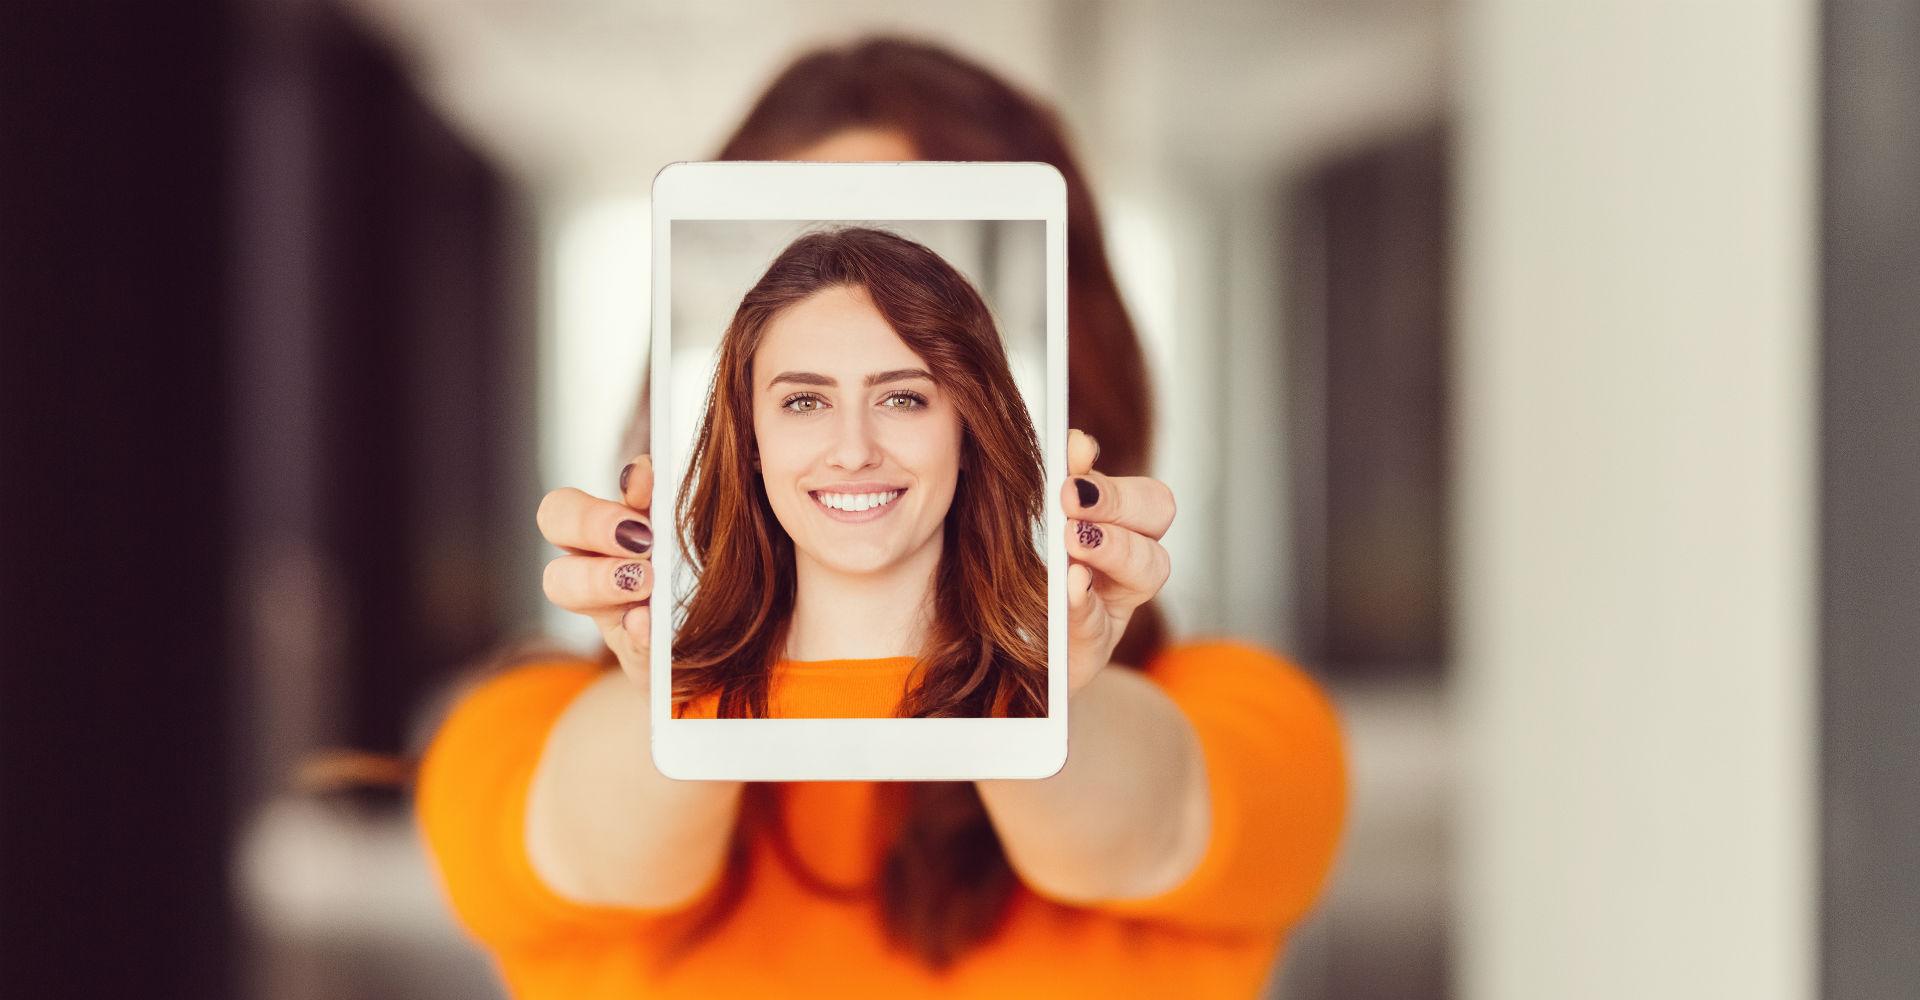 Frau hält eigenes Porträtfoto auf Tablet in die Kamera